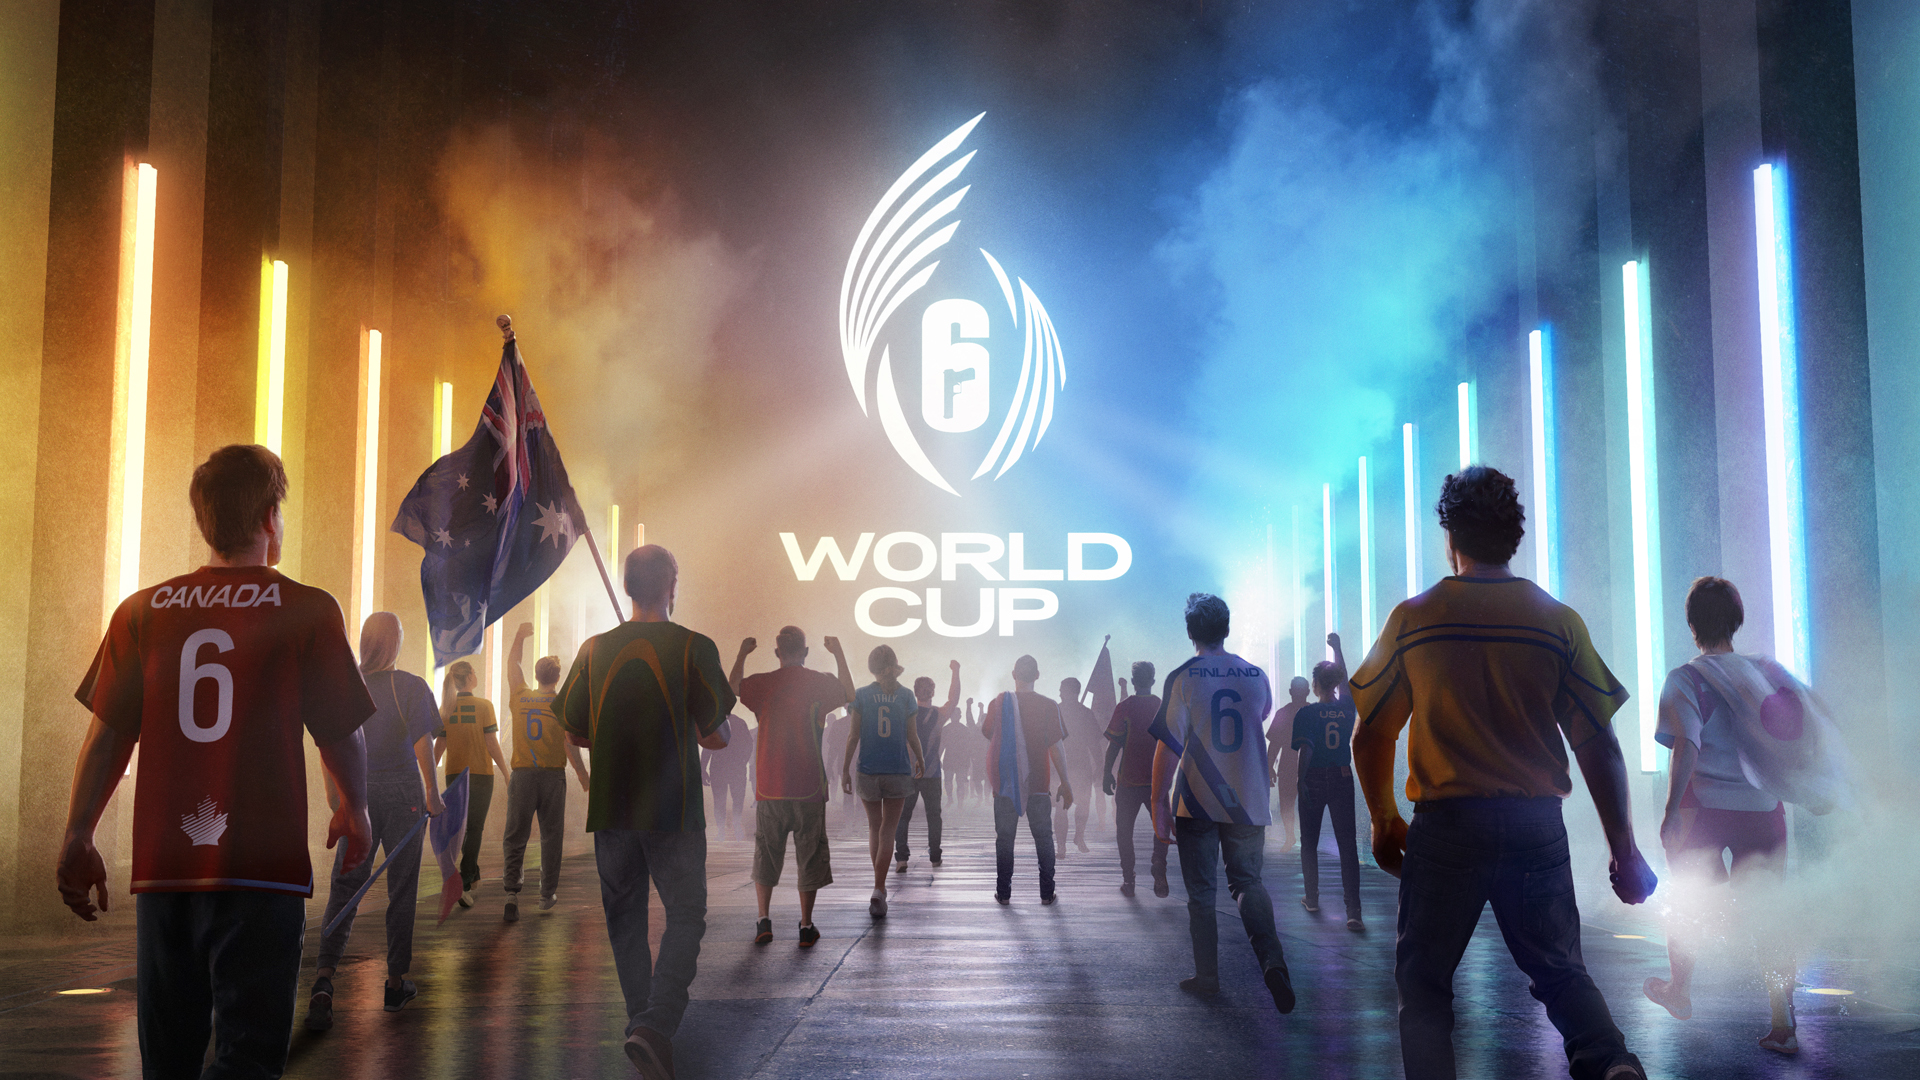 Best Operators Rainbow Six Siege 2021 Rainbow Six will kick off its first World Cup tournament in Summer